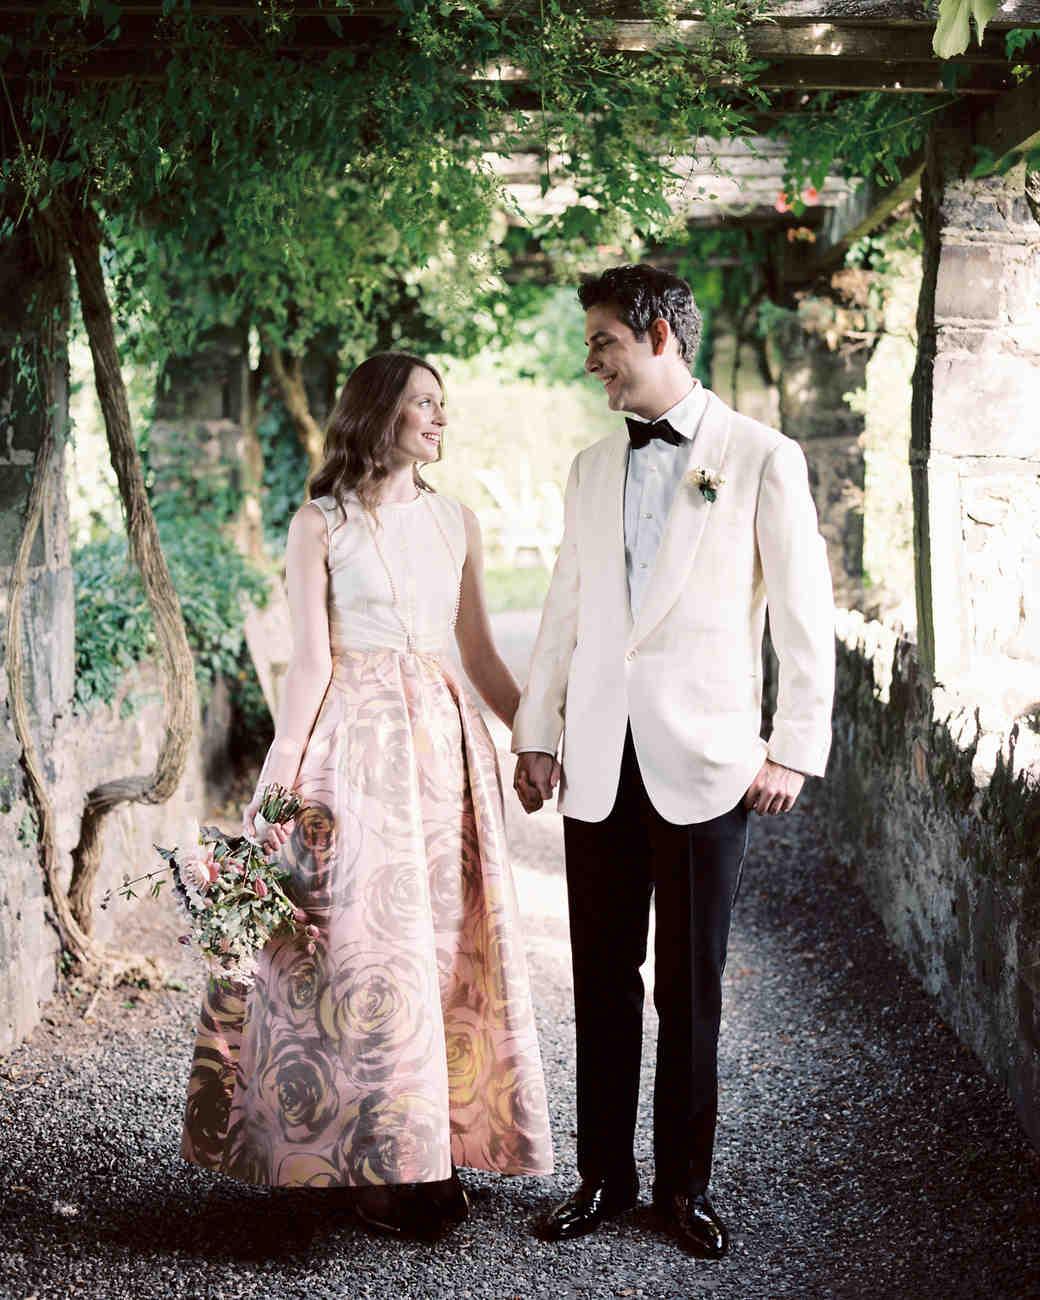 emily-marco-weddingarchway-0414.jpg